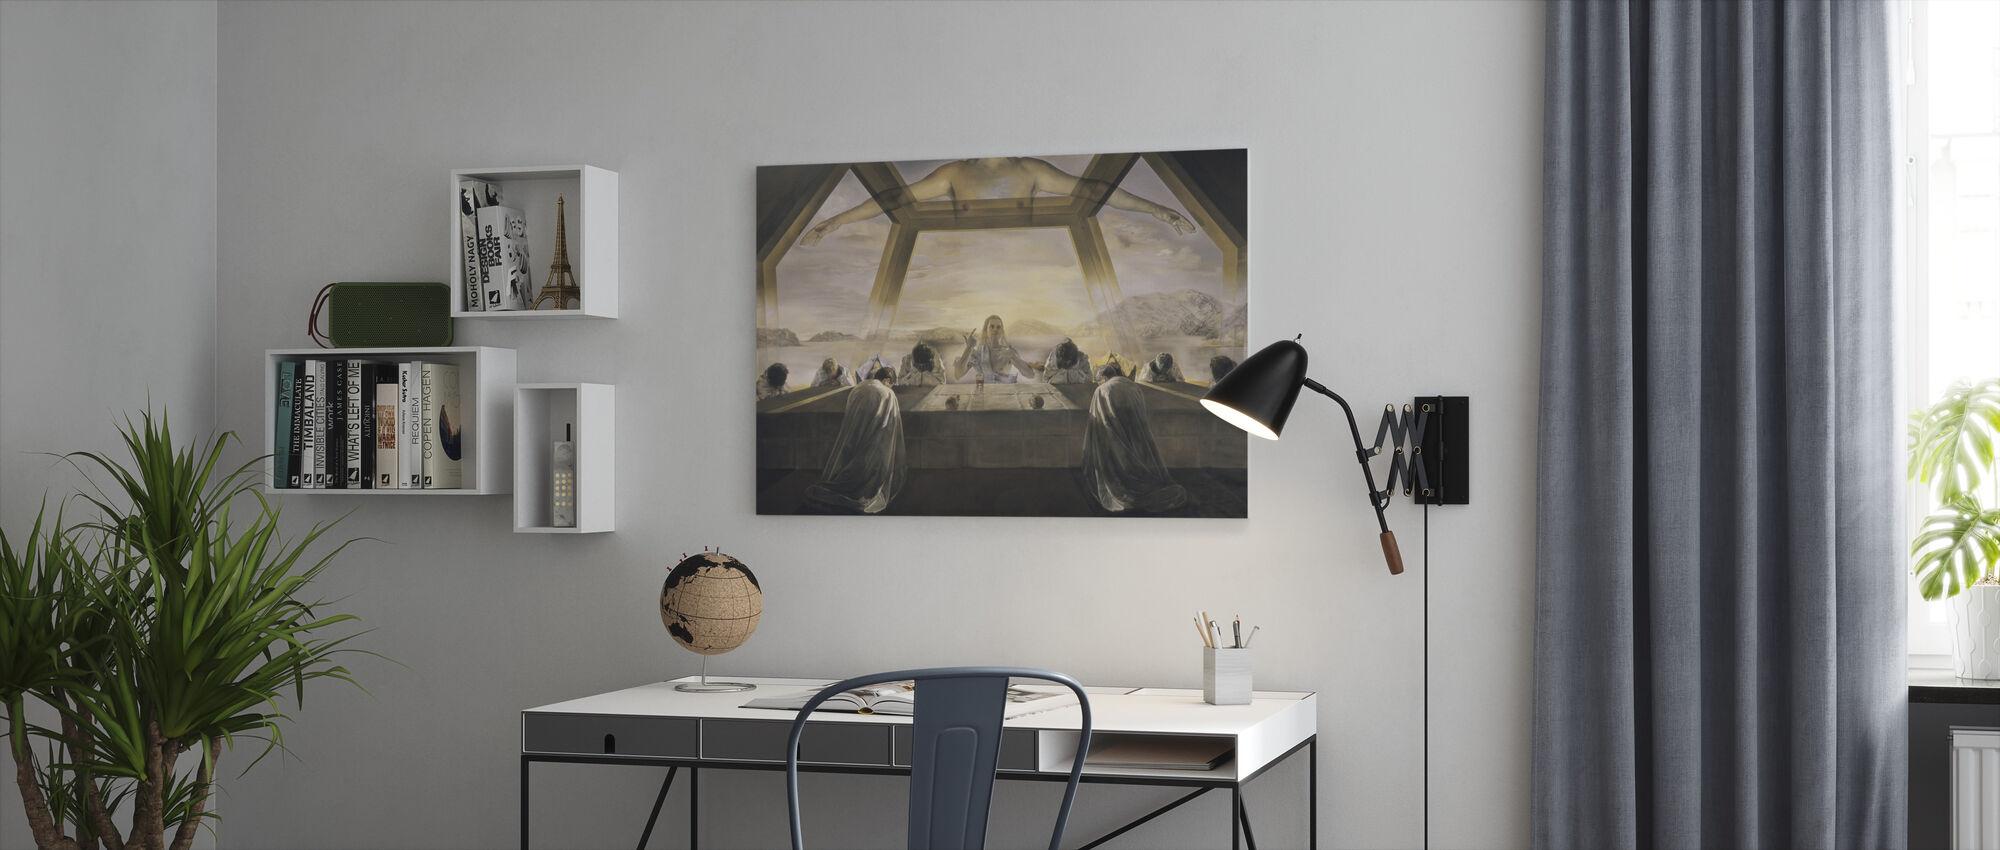 Sacrament of the Last Supper - Salvador Dali - Canvas print - Office